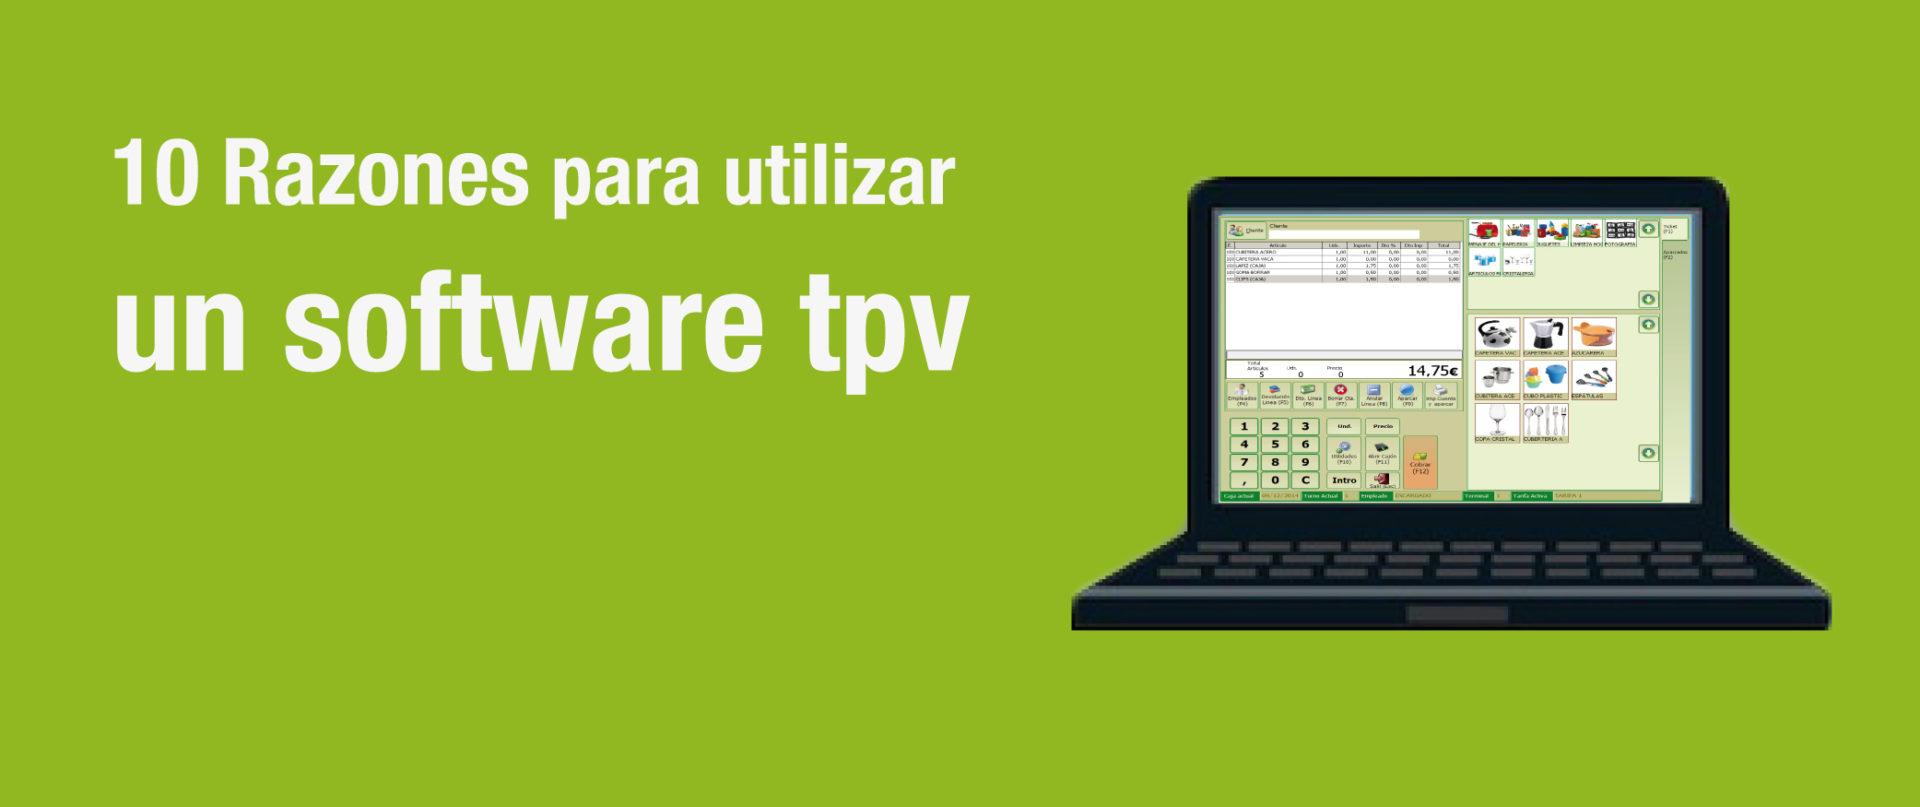 usar software tpv